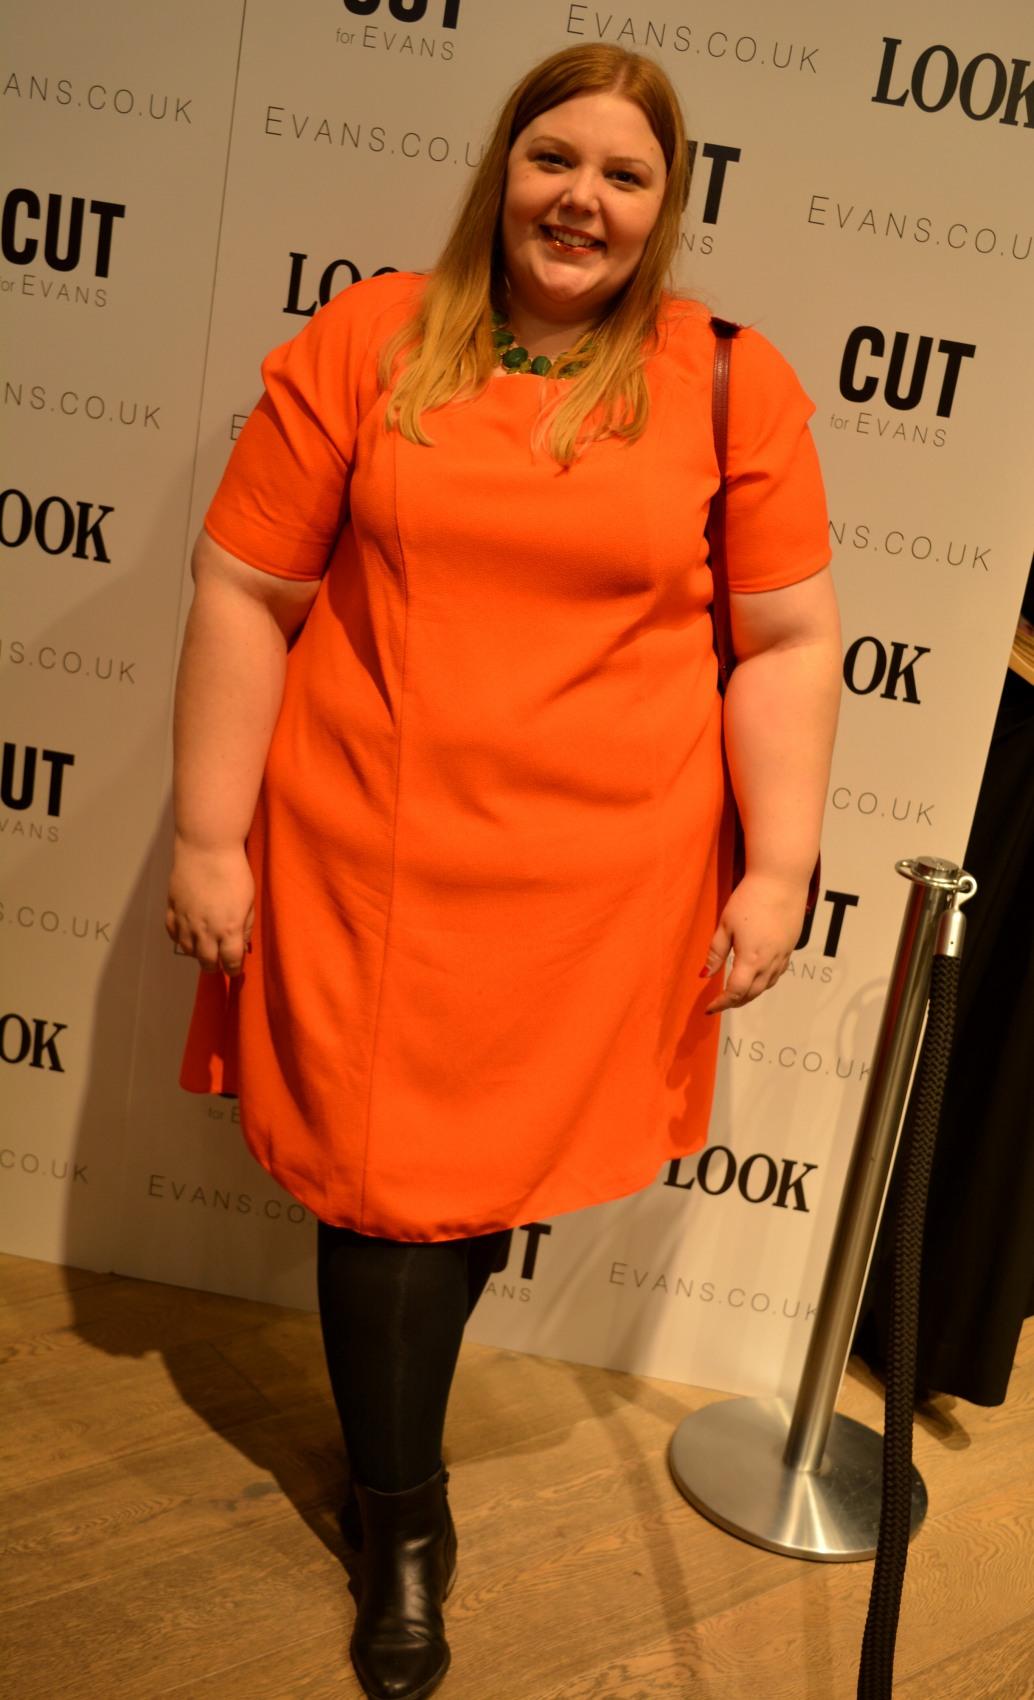 Evans Bright Orange Swing Dress